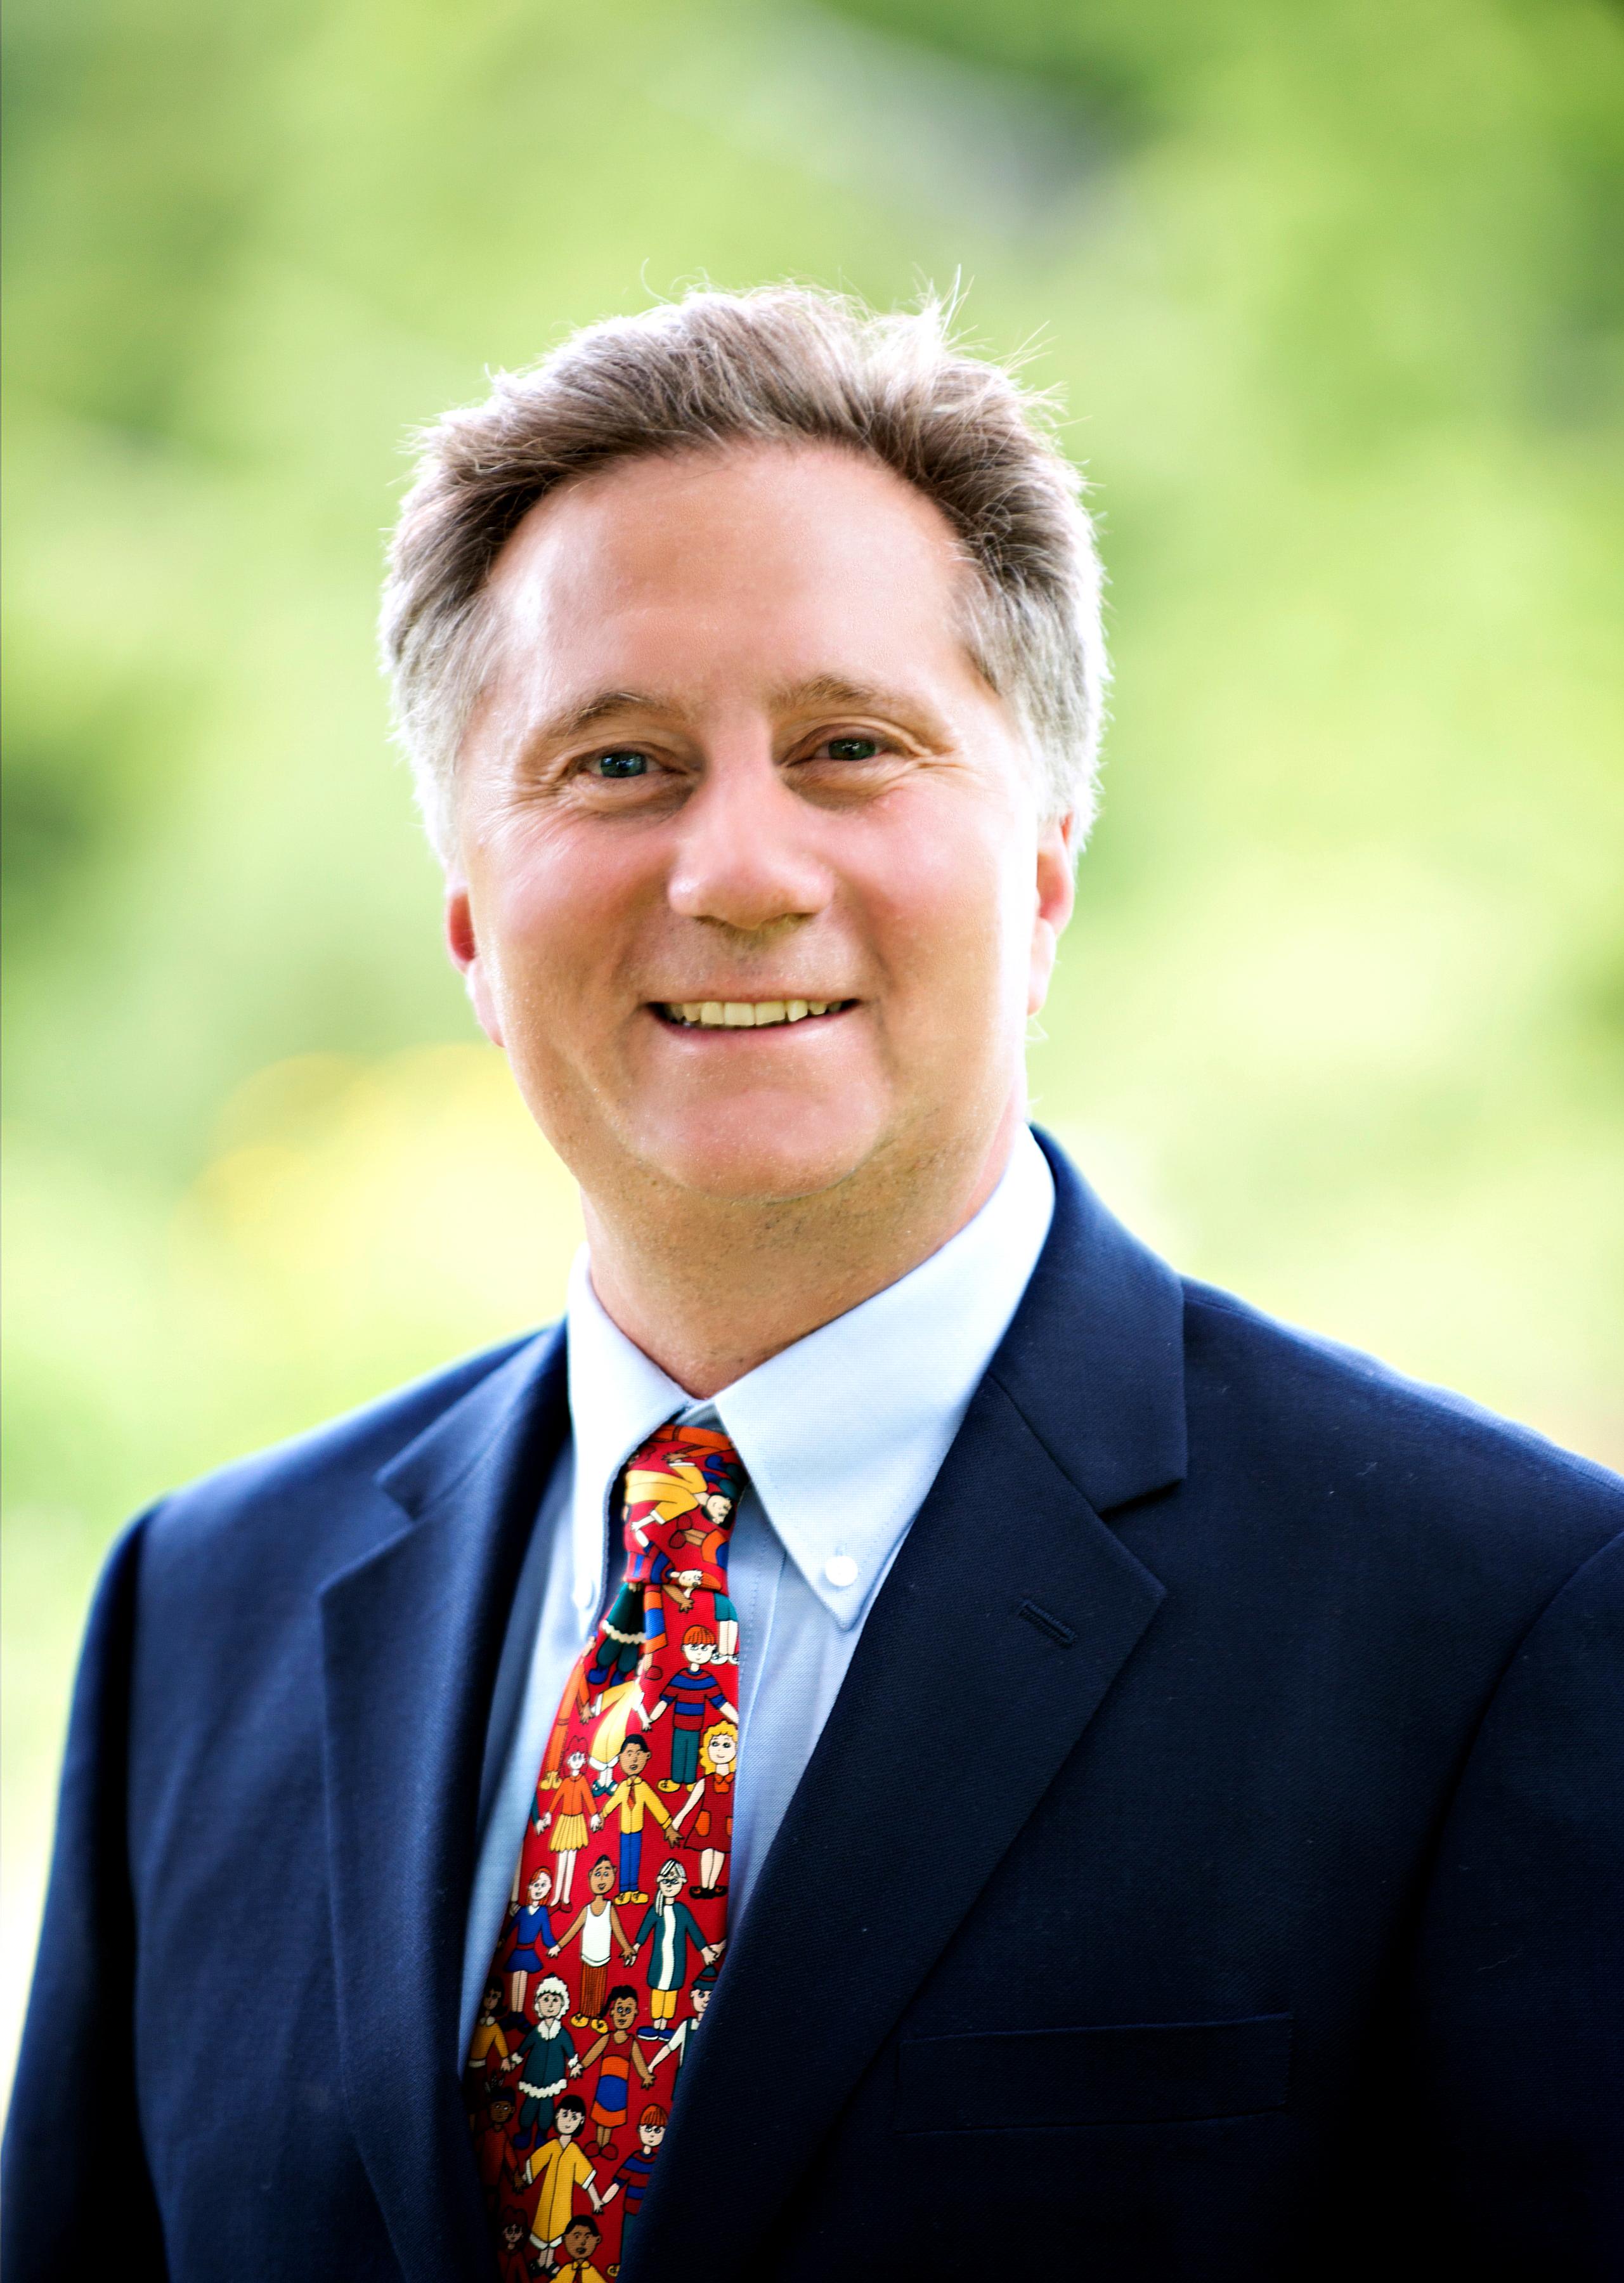 Judd Allen